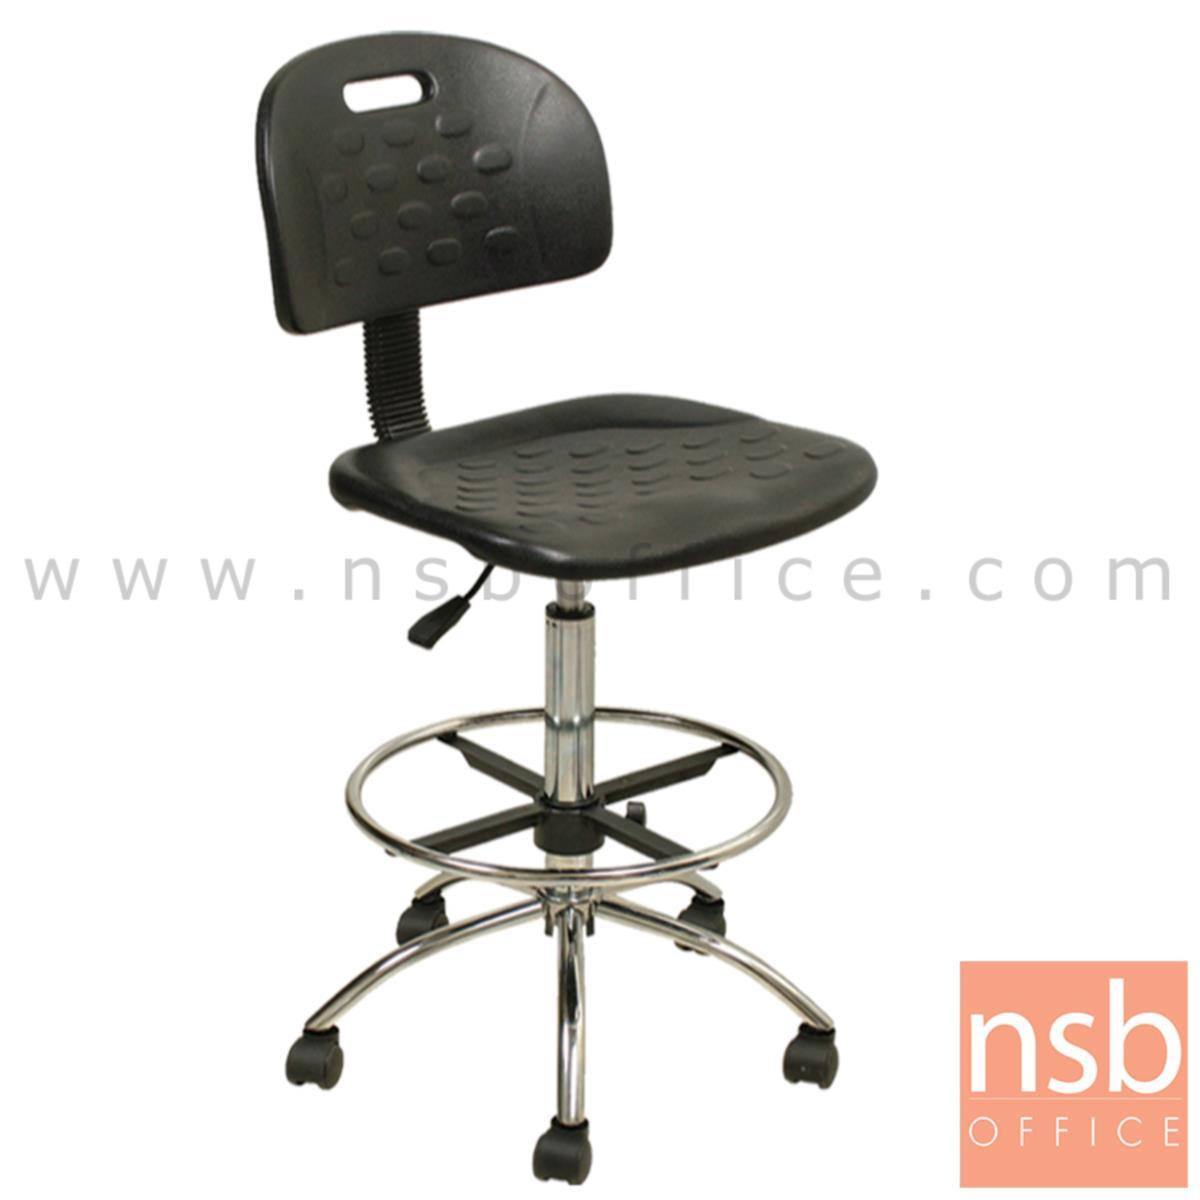 B09A085:เก้าอี้บาร์สตูลที่นั่งเหลี่ยมล้อเลื่อน รุ่น Murdoch (เมอร์ด็อค)  โช๊คแก๊ส ขาเหล็กชุบโครเมี่ยม